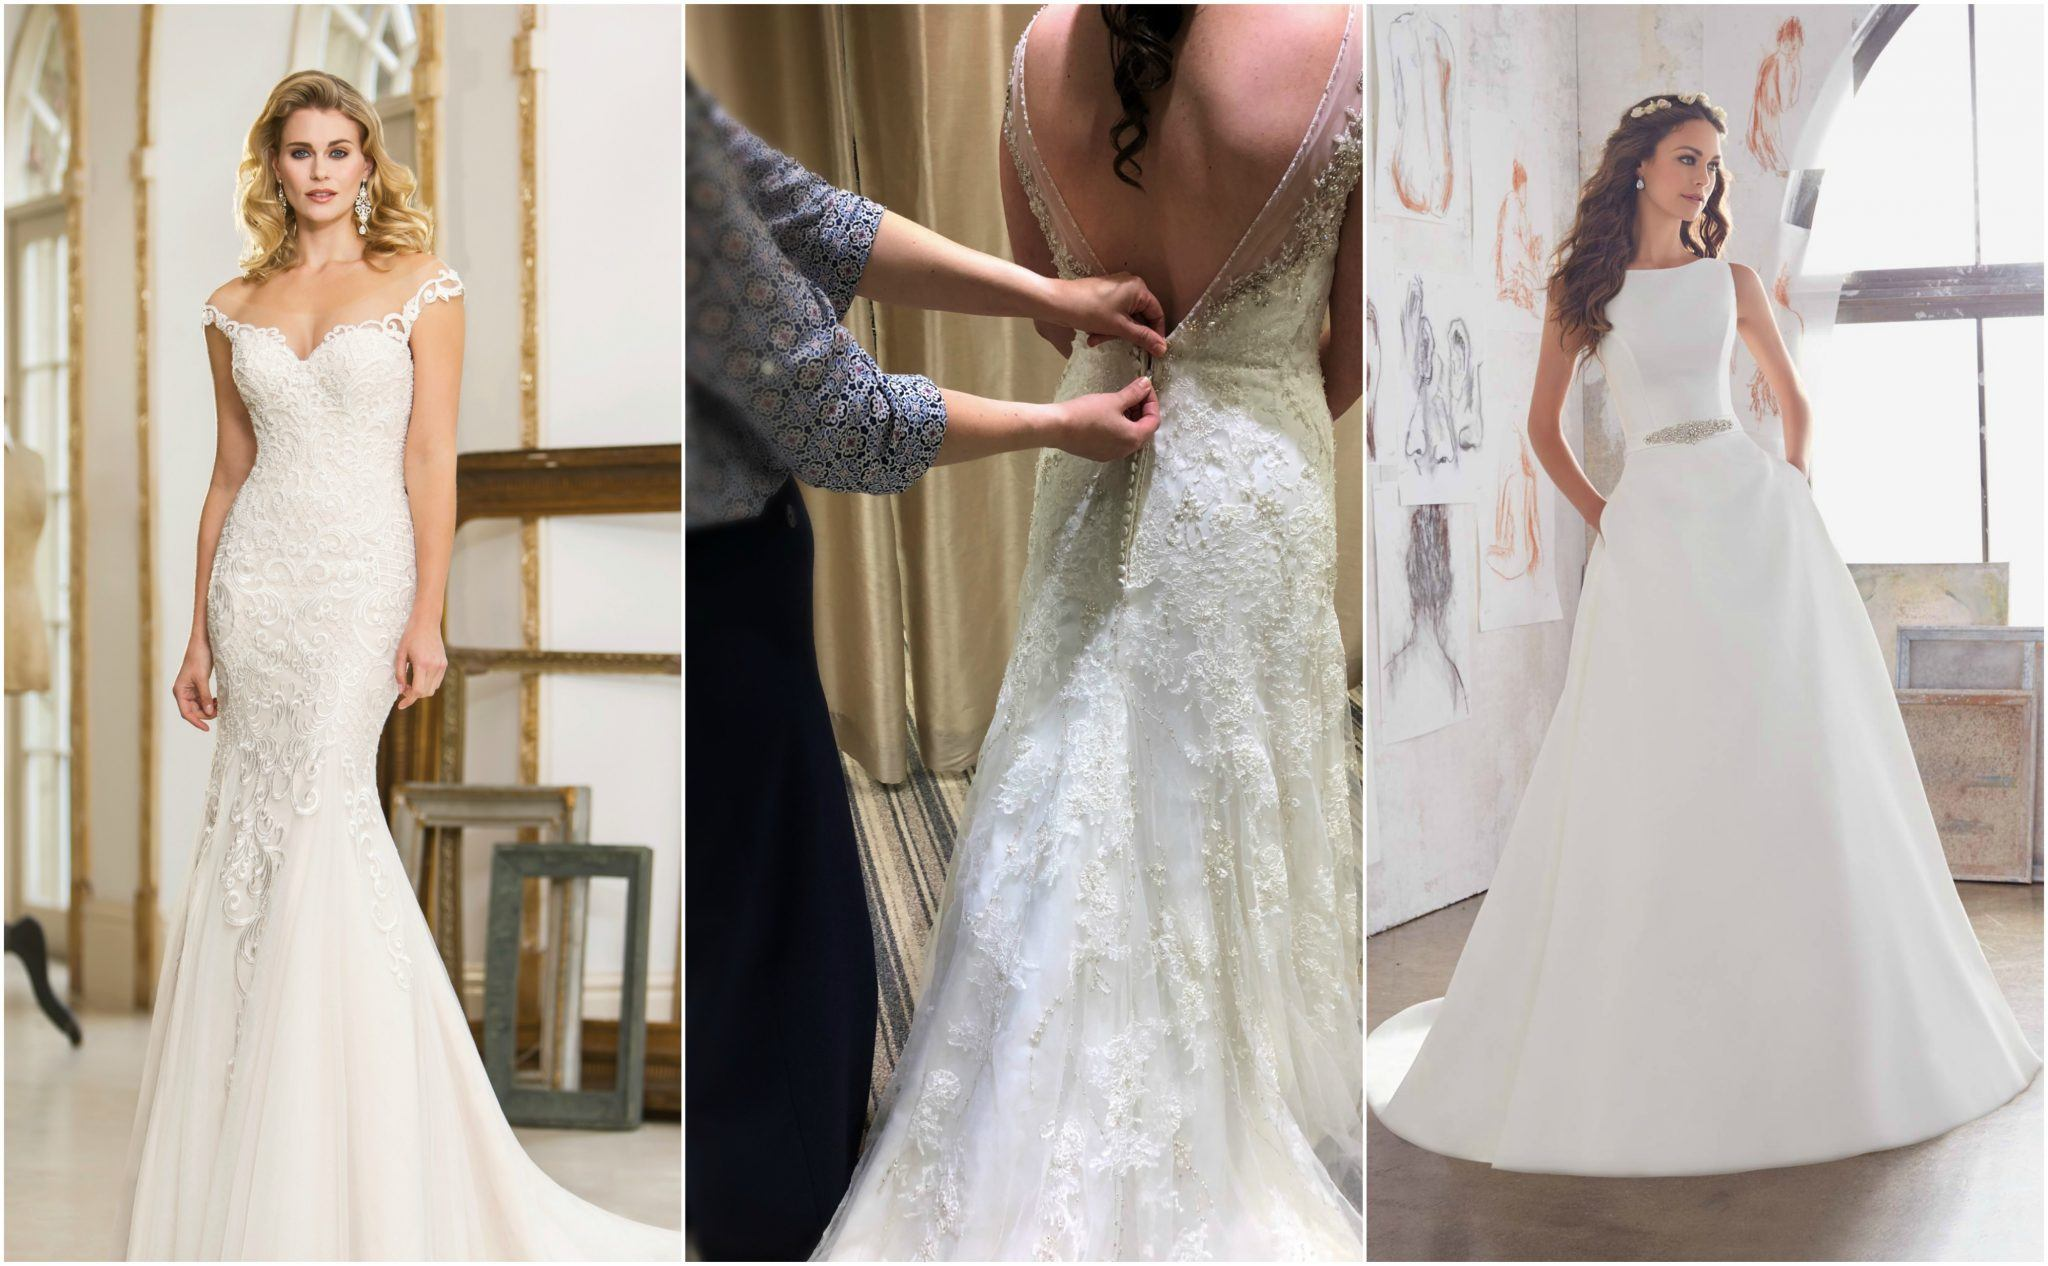 Finding the Perfect Wedding Dress | La Fleur Bridal